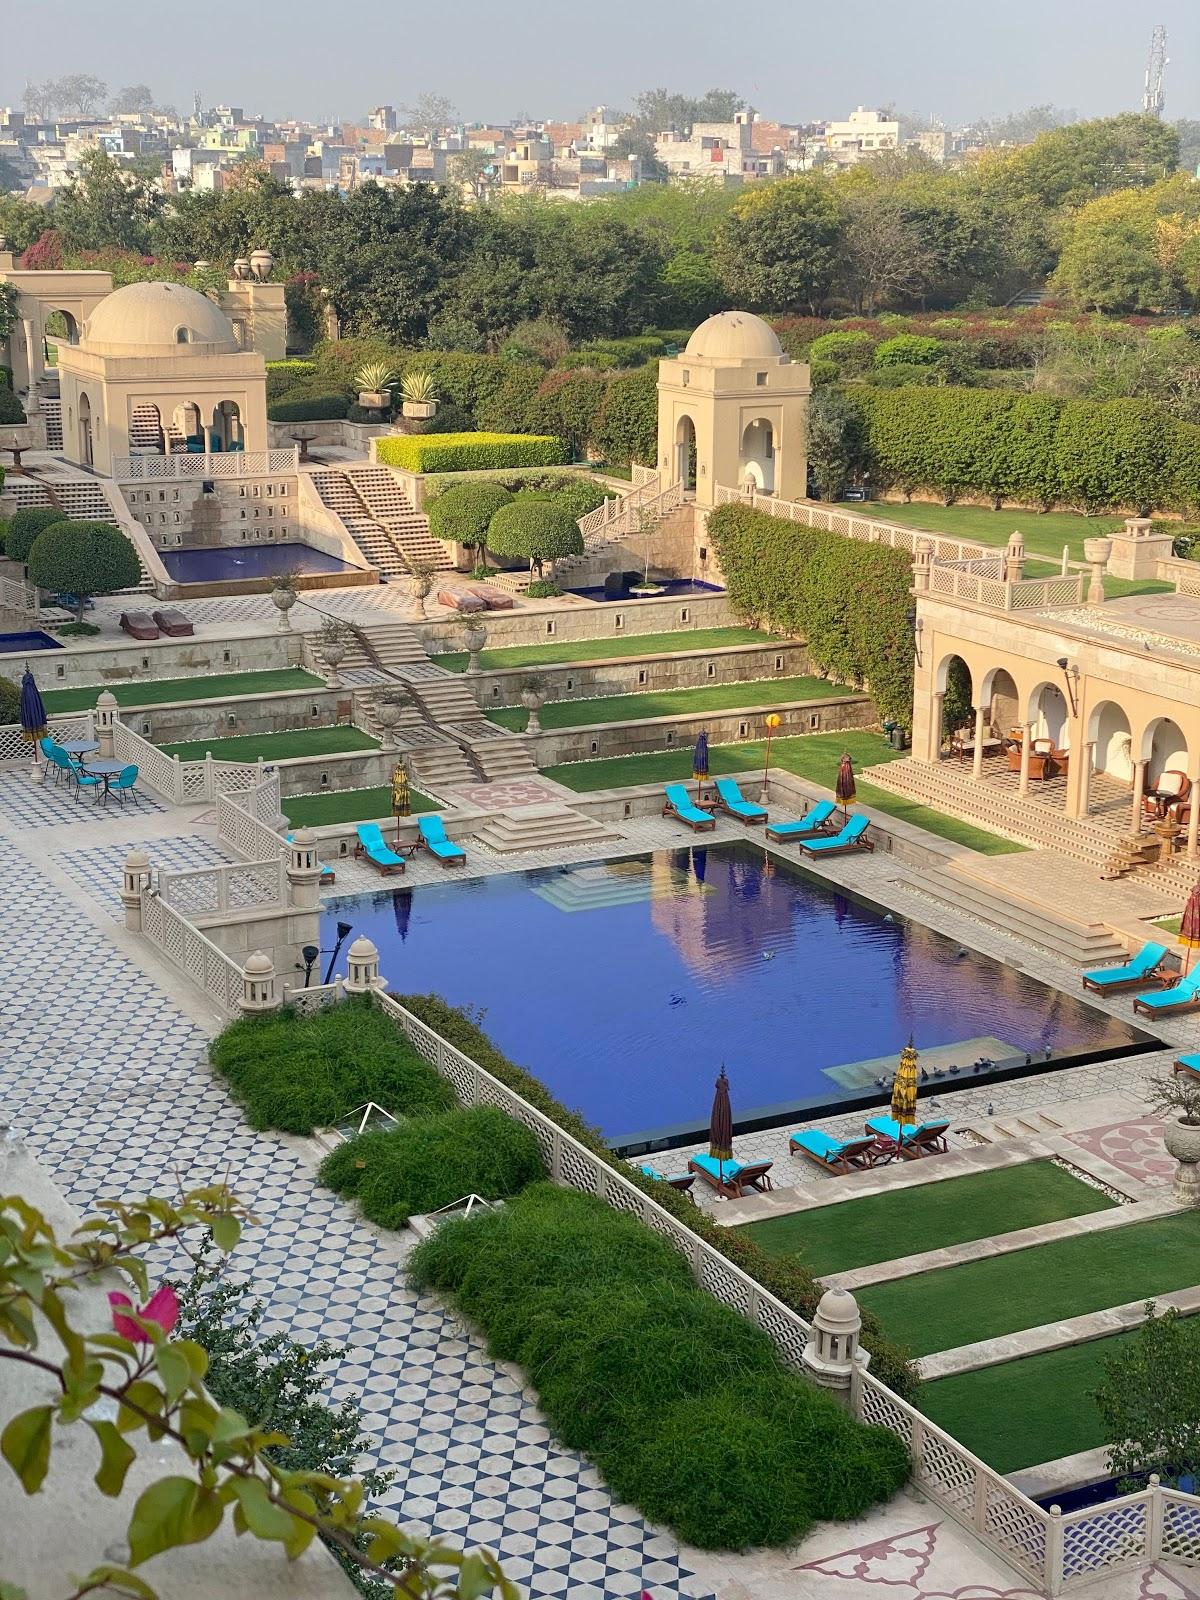 agra oberoi amarvila hotel joy street design inspiration abroad india mughalo